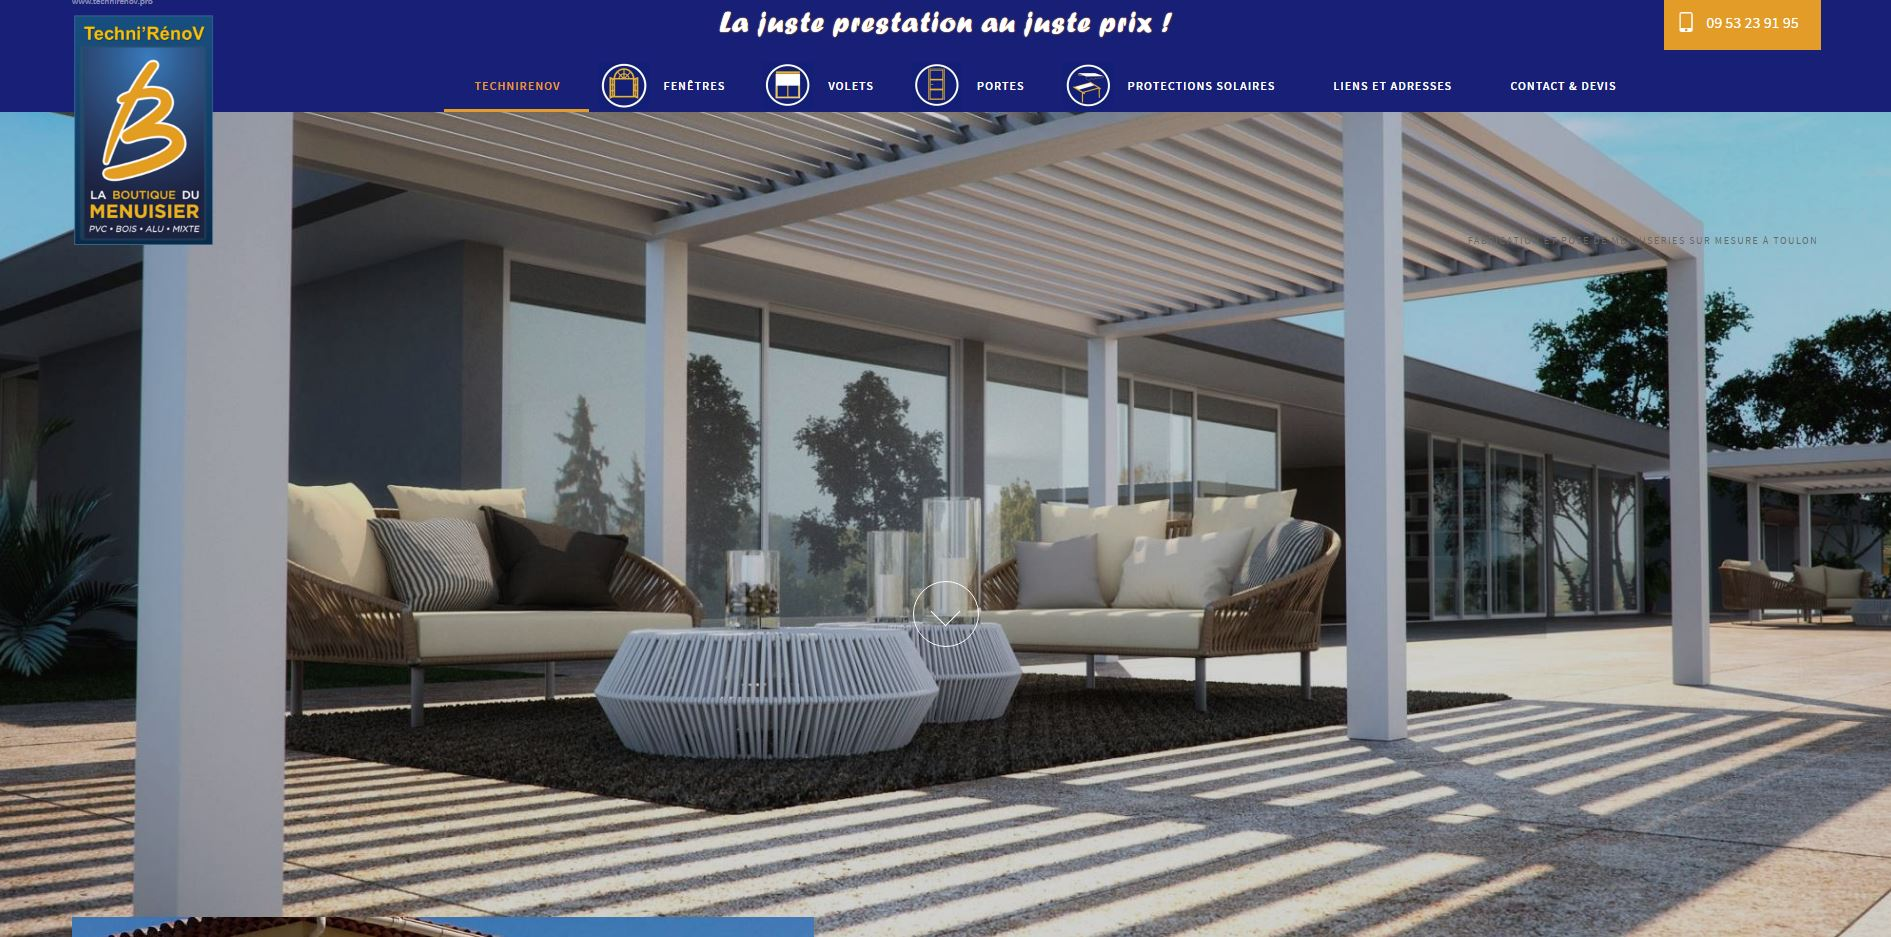 fabricant fran ais de menuiseries toulon techni r nov artisanat de france. Black Bedroom Furniture Sets. Home Design Ideas